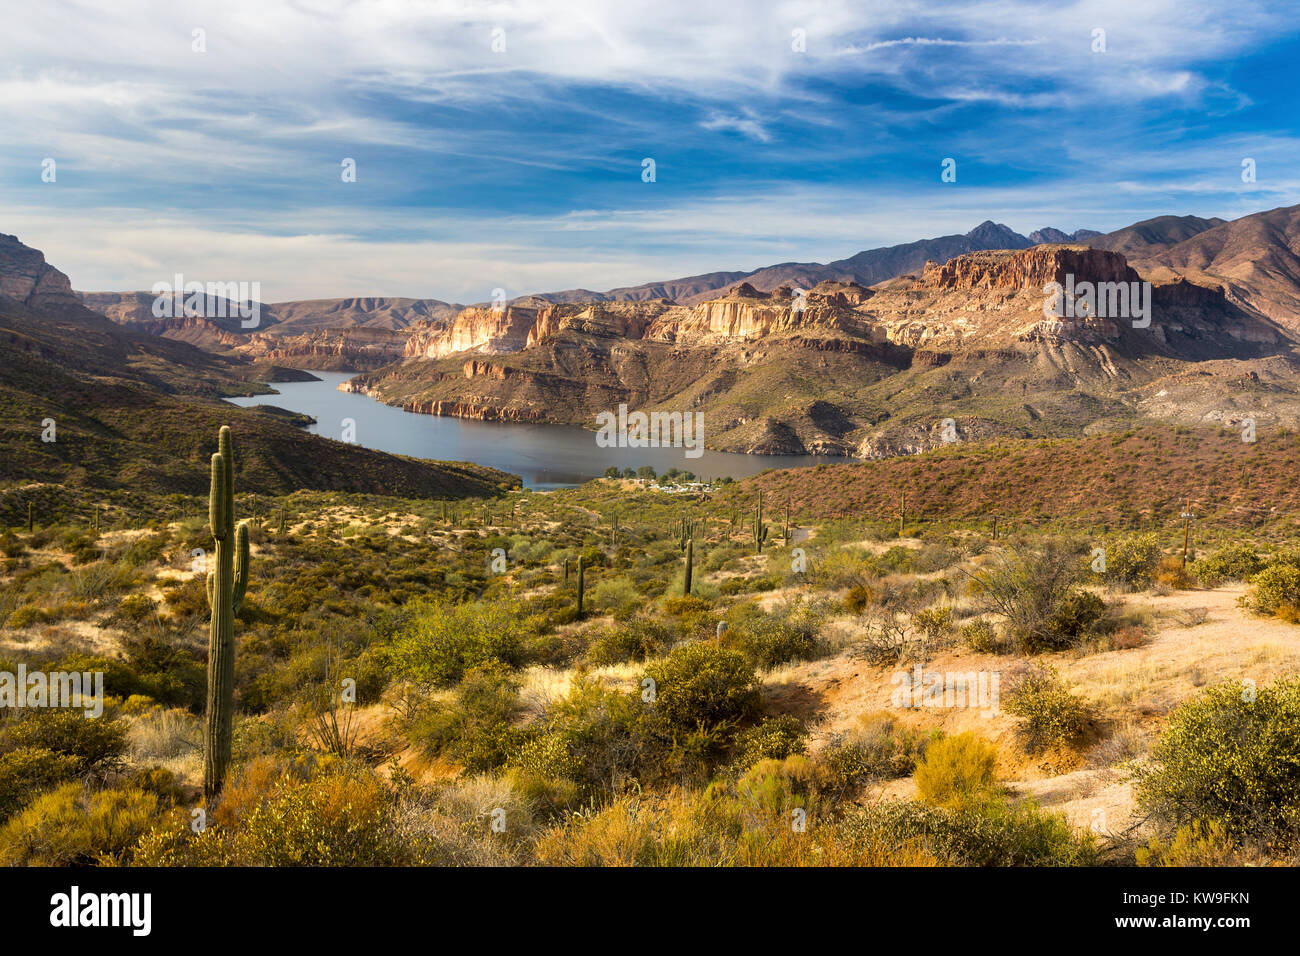 apache-lake-distant-scenic-desert-landsc